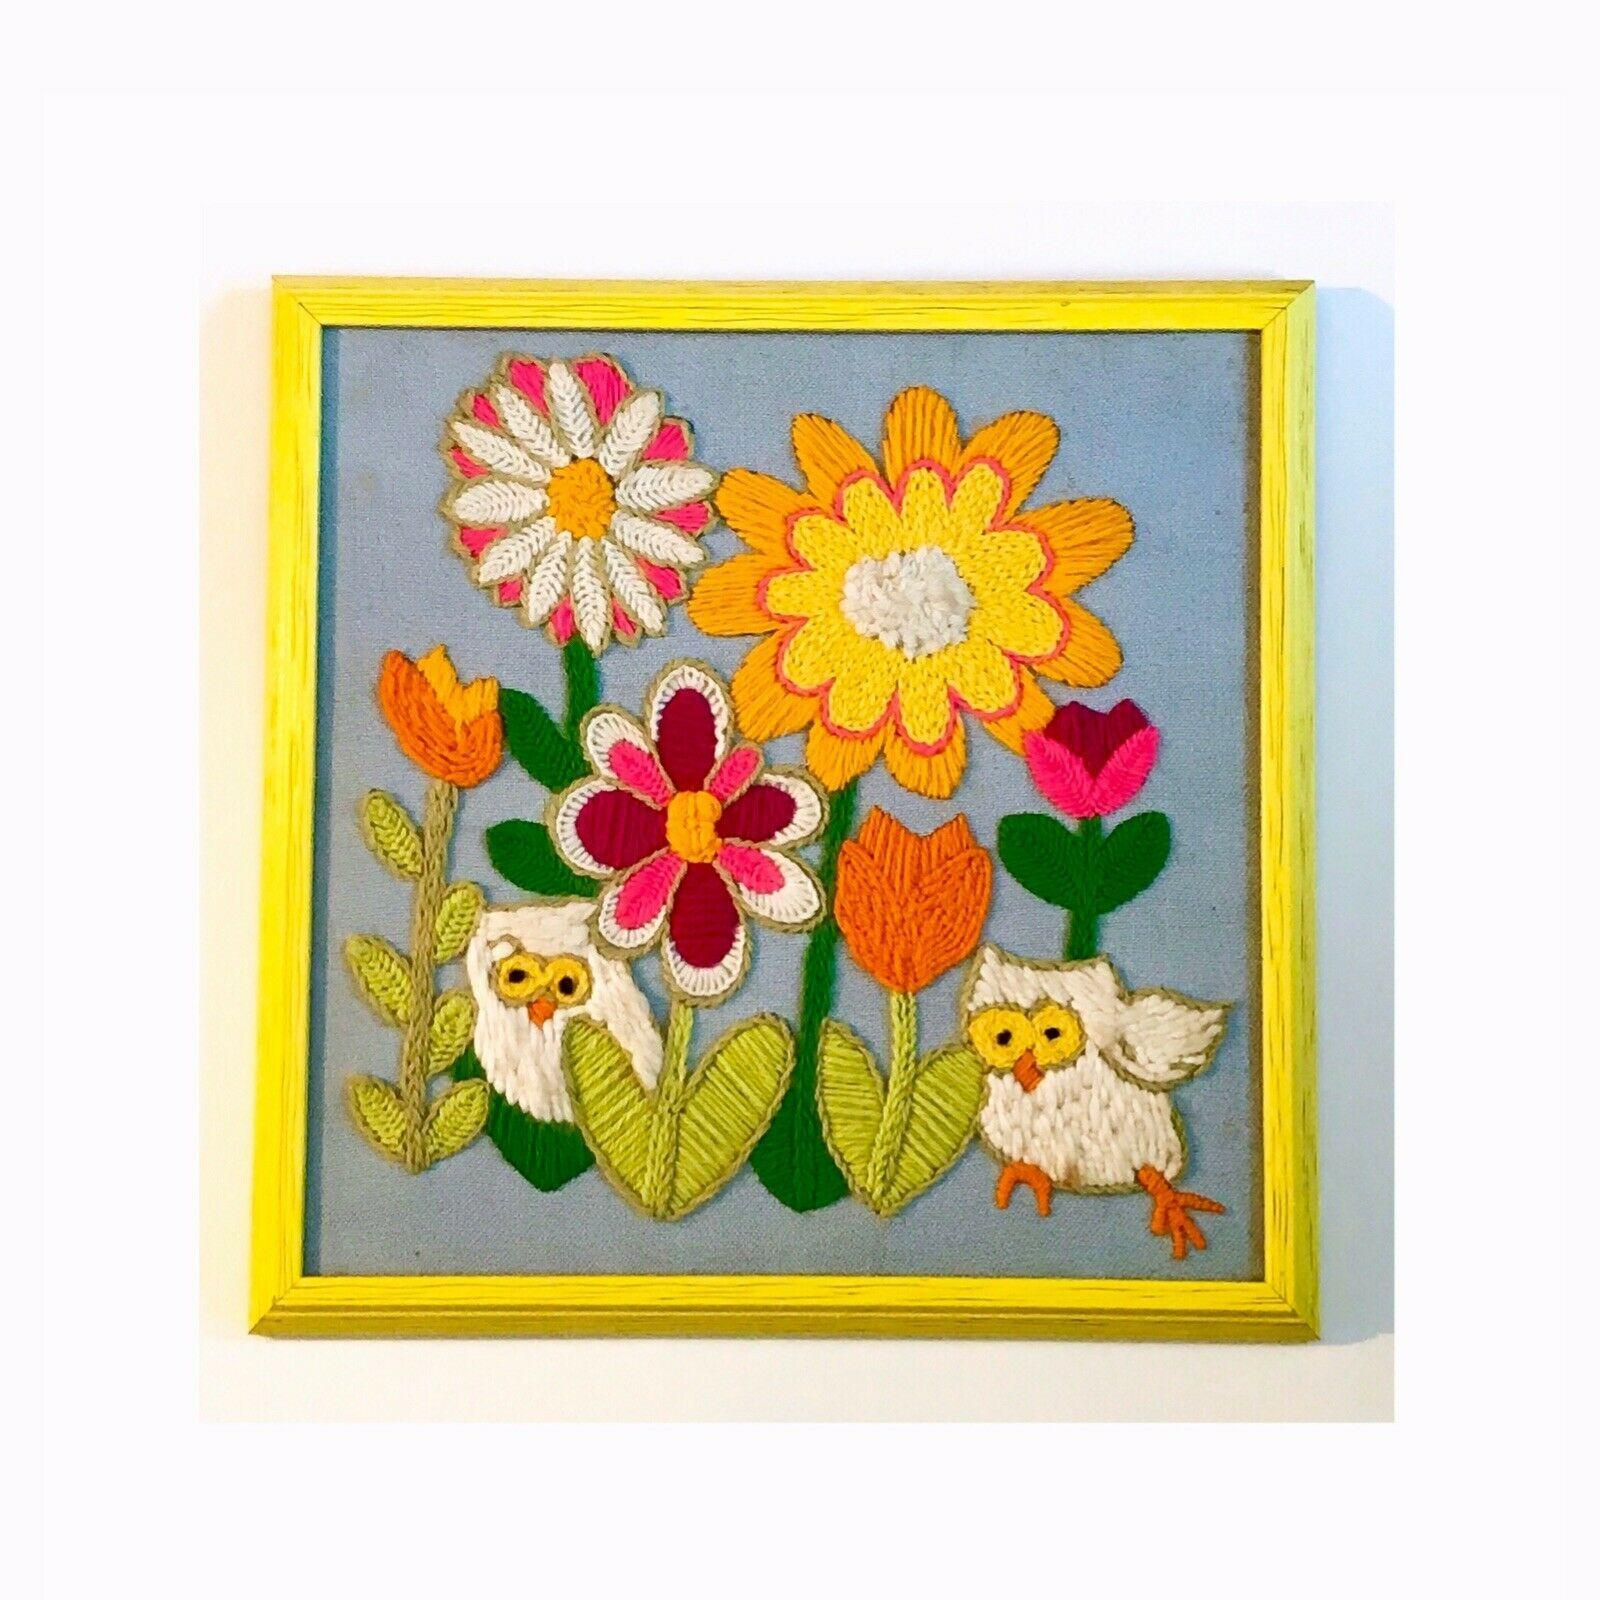 Vintage Crewel Mcm Yarn Embroidery Needlepoint Wall Art Framed Flower Owl 70s Ebay Embroidery Wall Art Burlap Wall Art Needlepoint